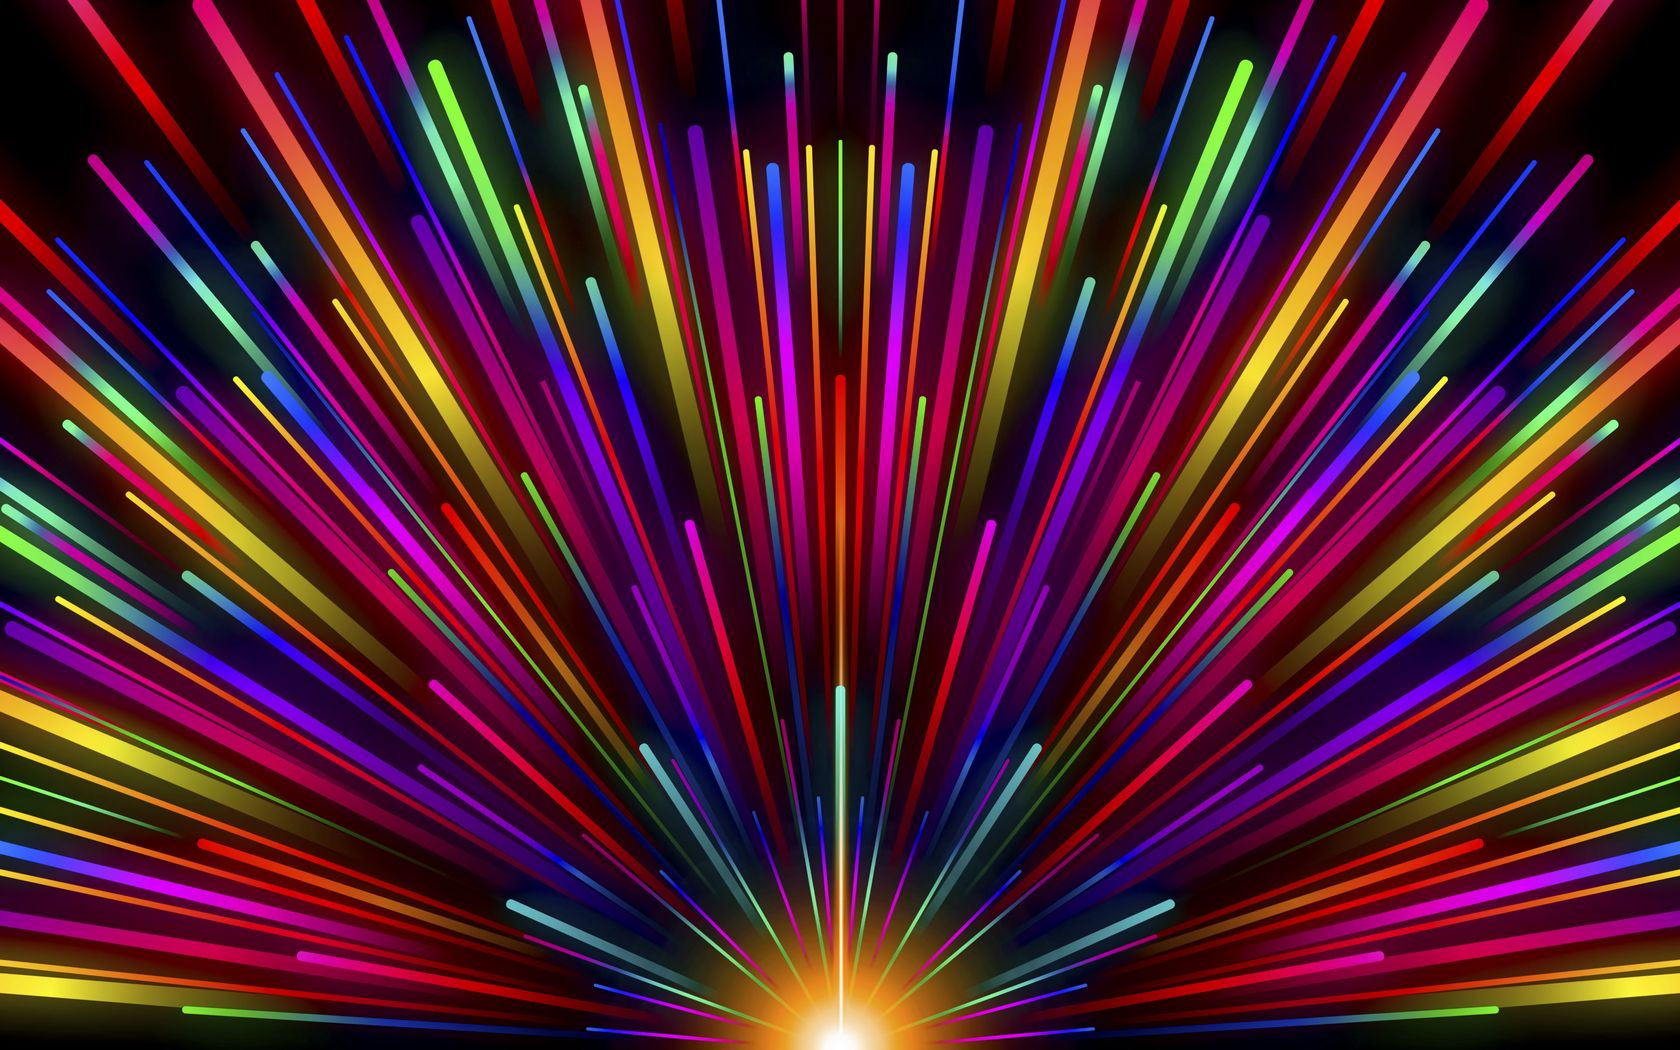 1680x1050 Wallpaper rays, stripes, multicolored, glow, rainbow